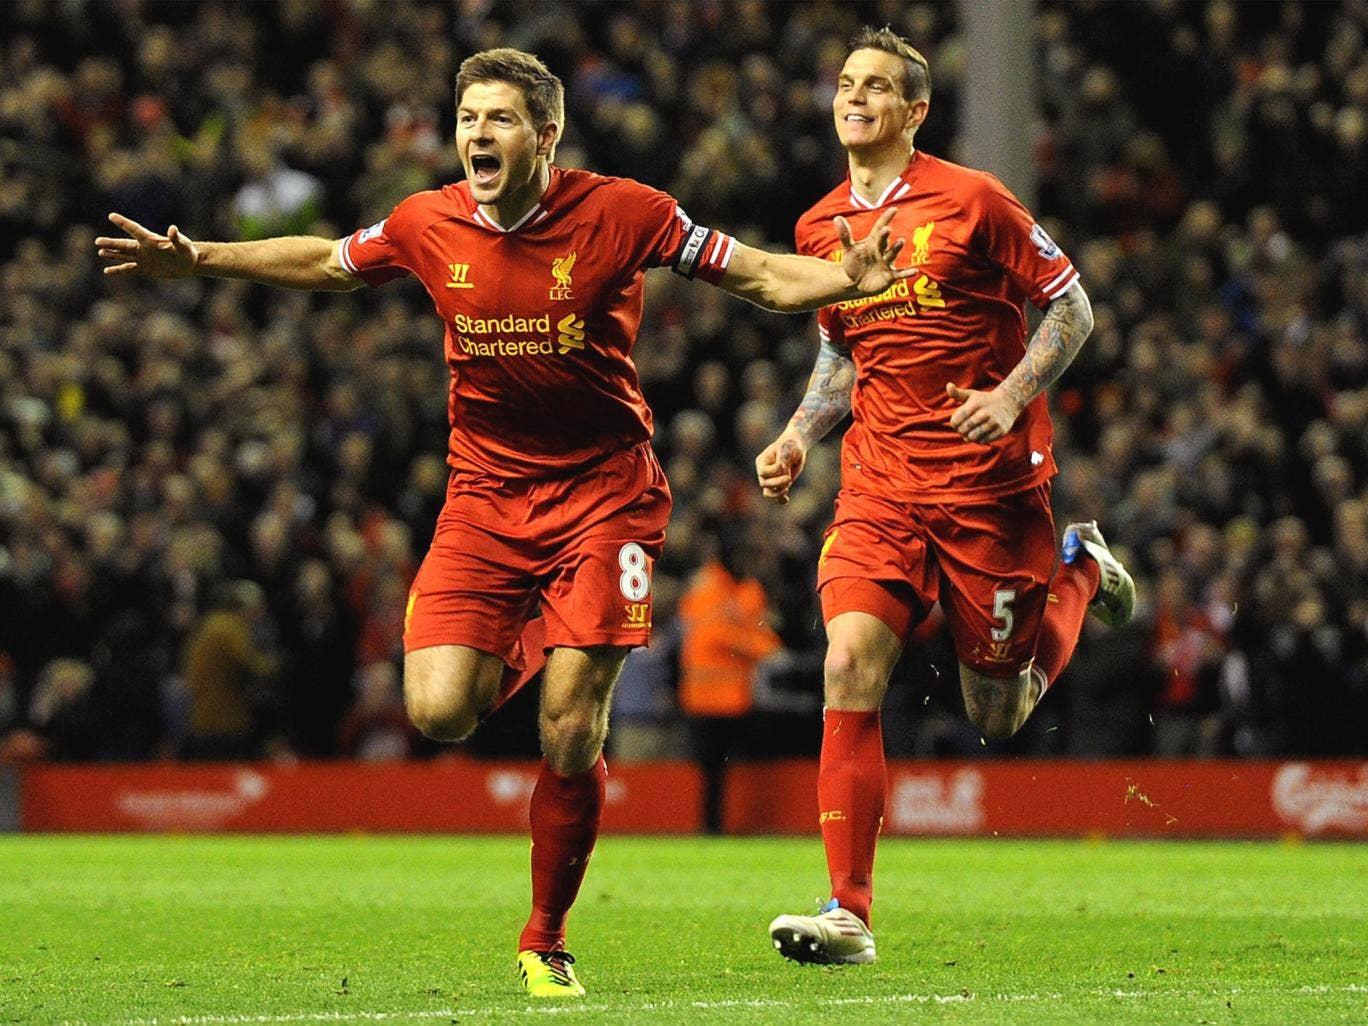 Steven Gerrard celebrates with Jordan Henderson after opening the scoring